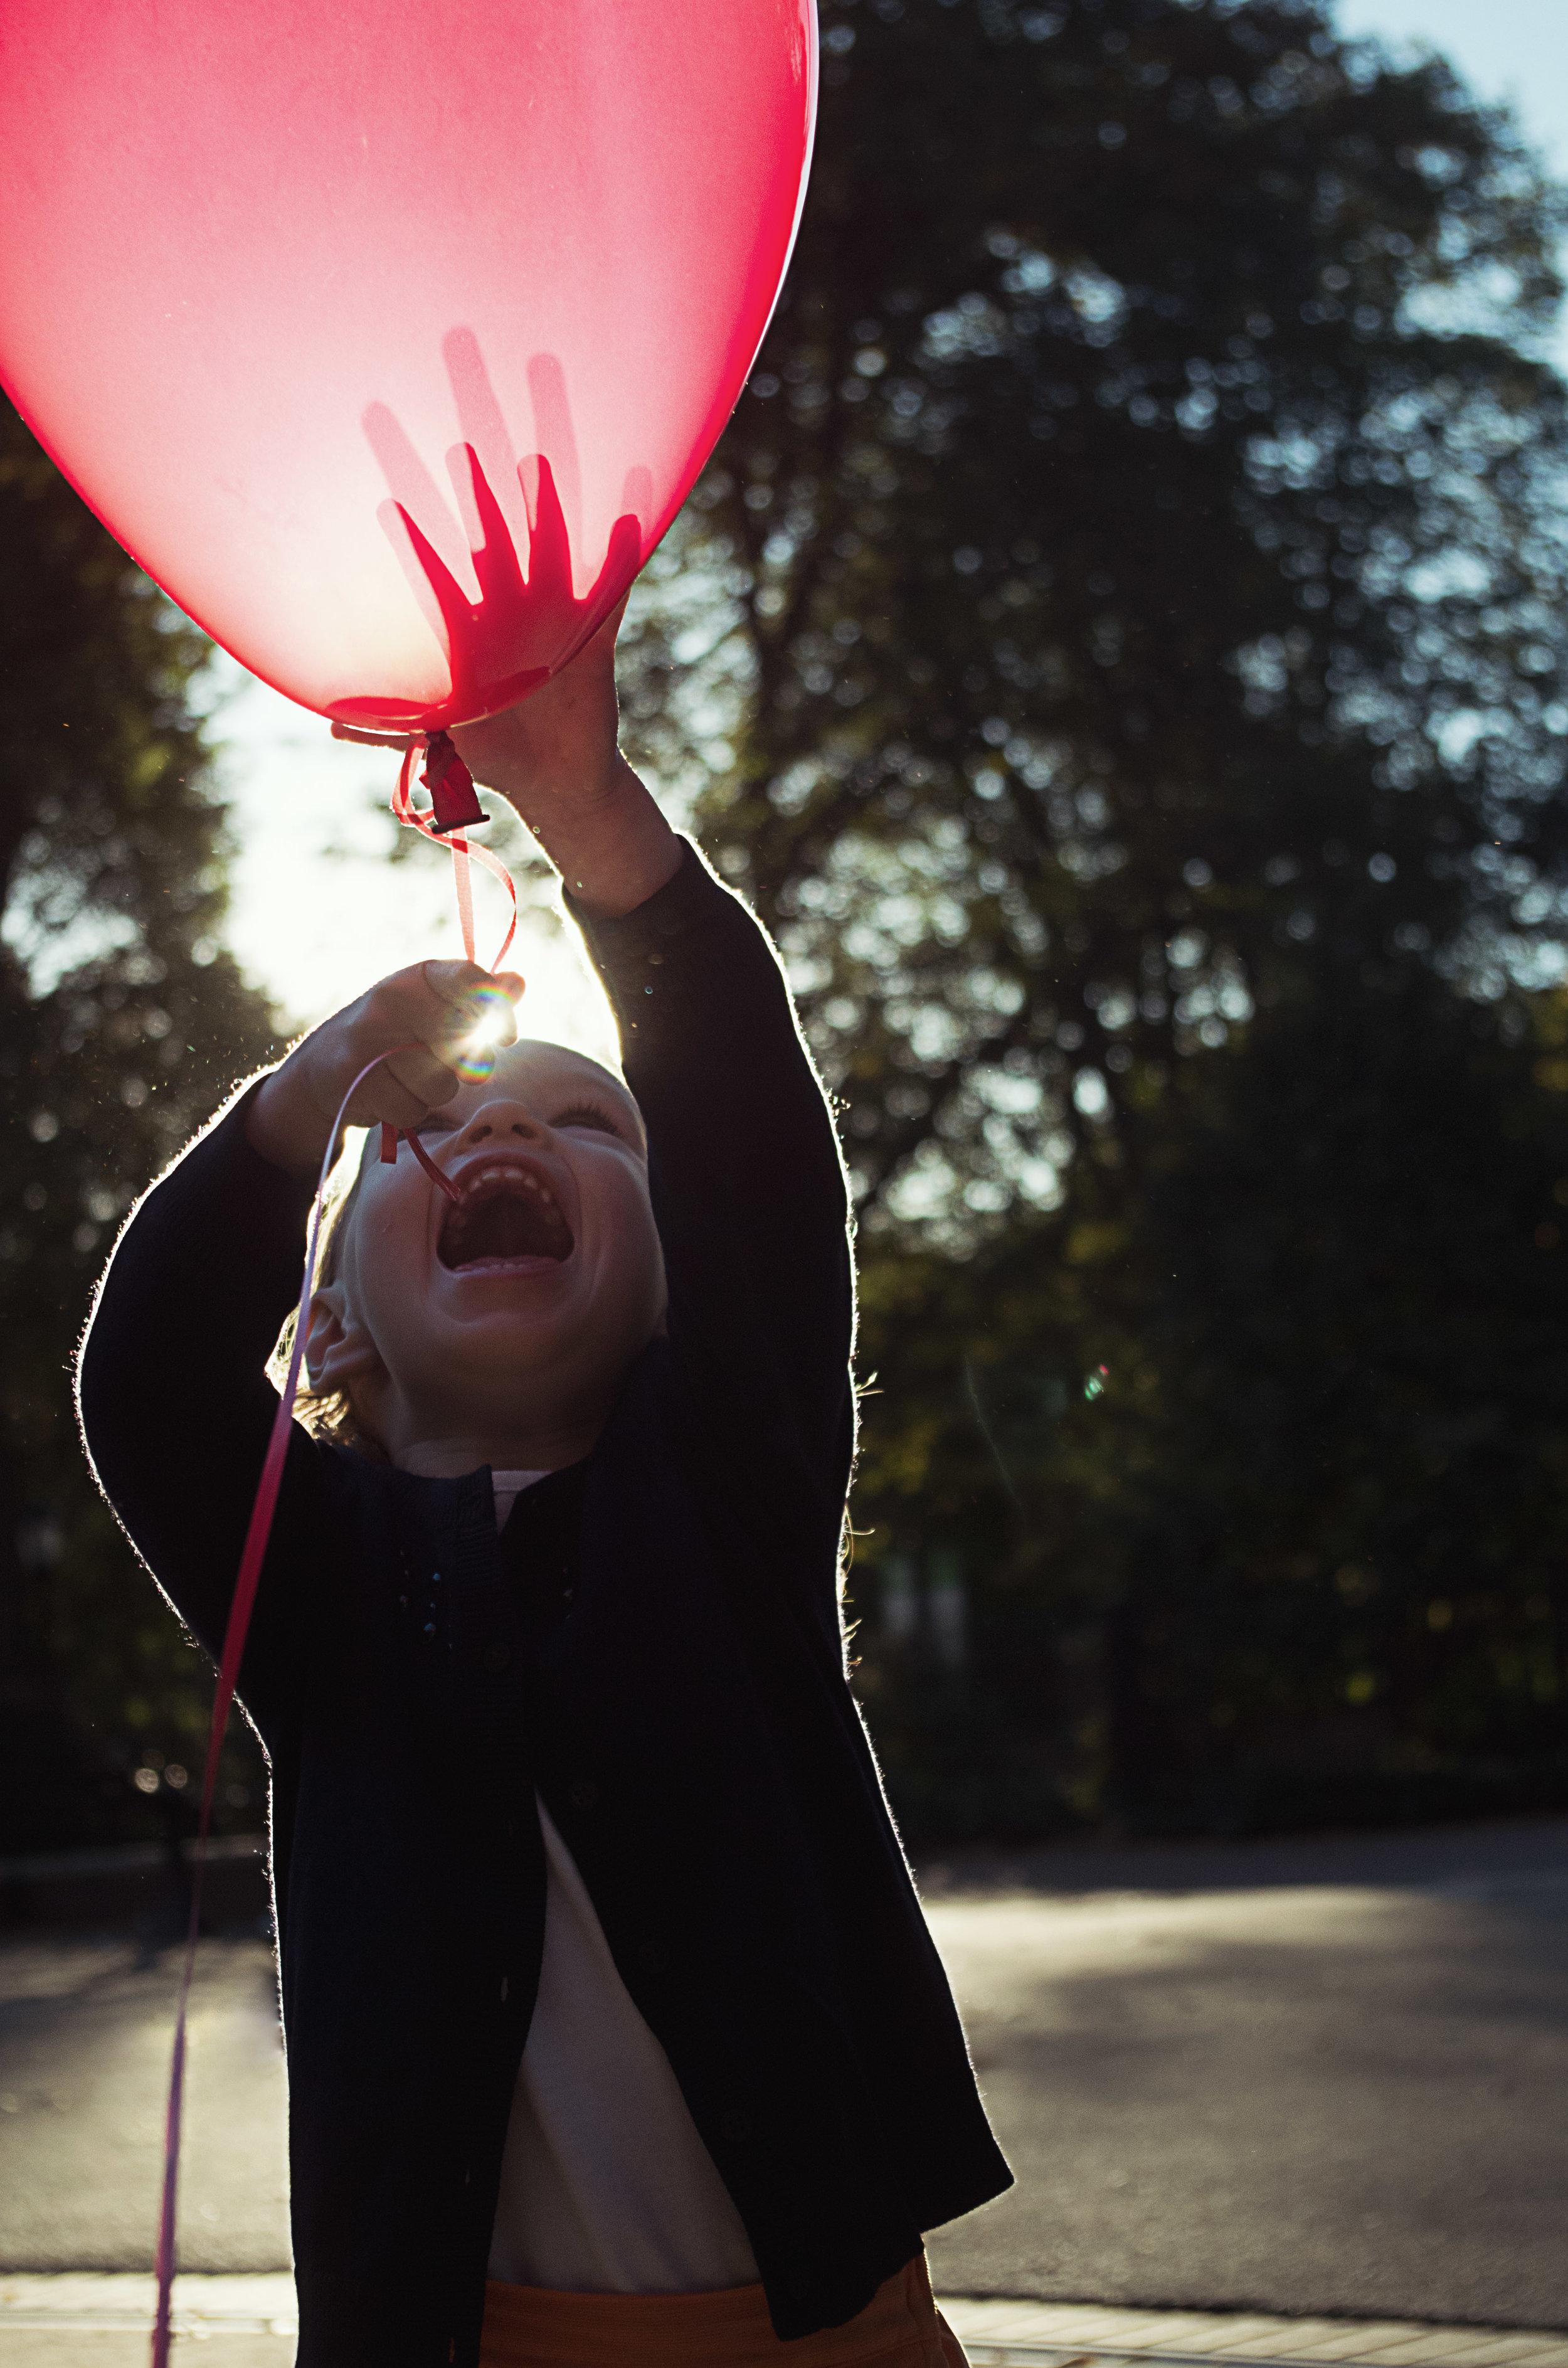 charlotte_balloon.jpg